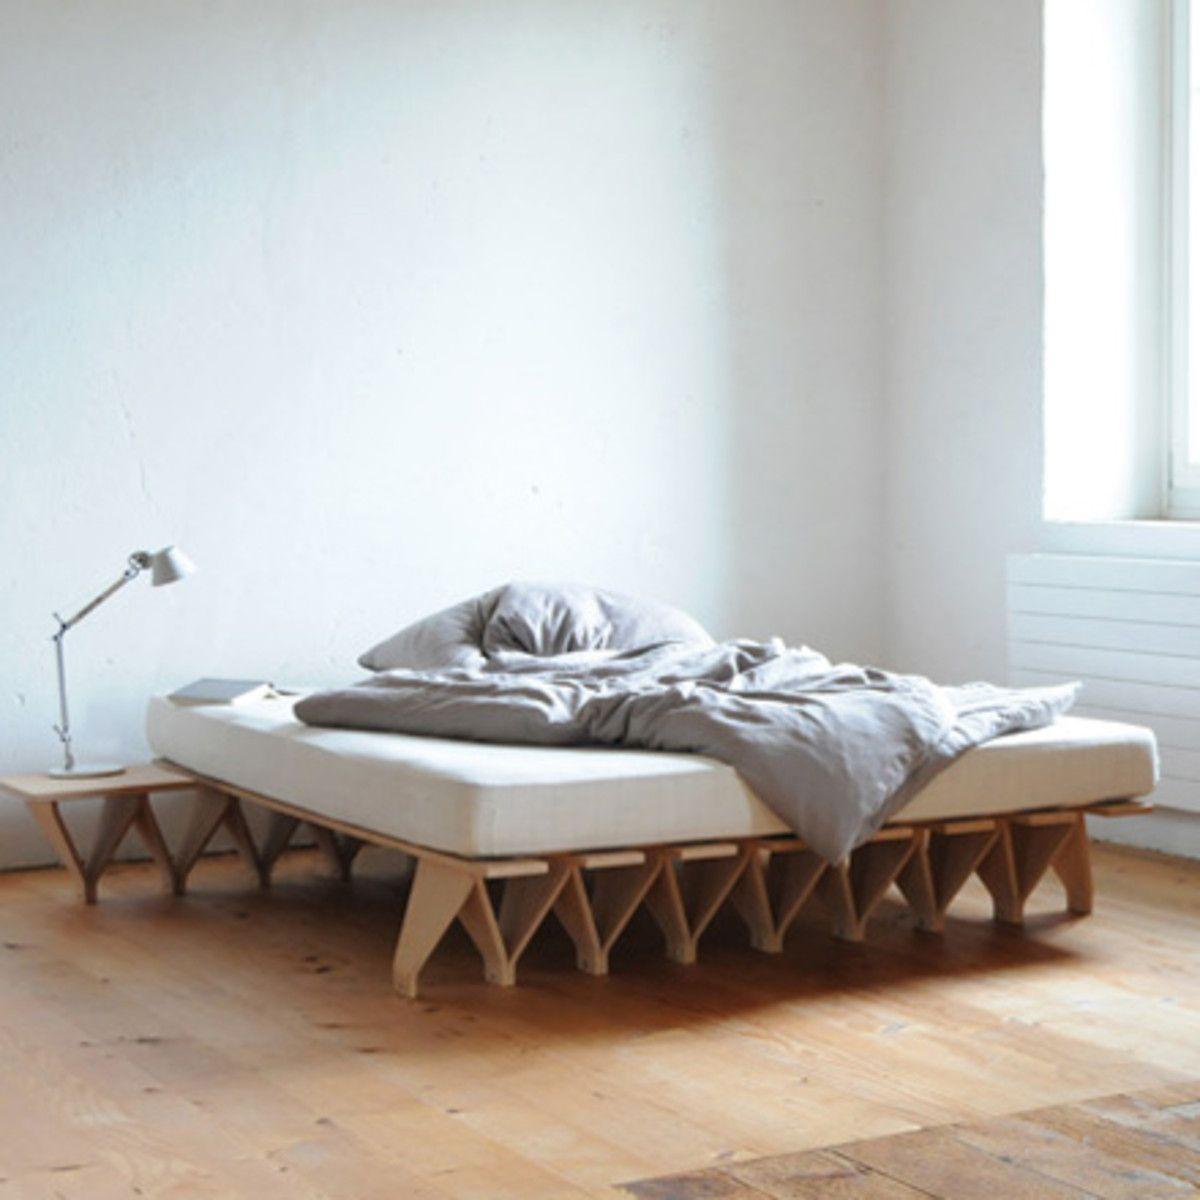 Full Size of Tojo Bett System 140 Gebraucht Kaufen V Bett Bettgestell Vario Aufbauen Erfahrungen V Bewertung Variabel Parallel 160 Weiss Günstige Betten 180x200 Bett Tojo Bett